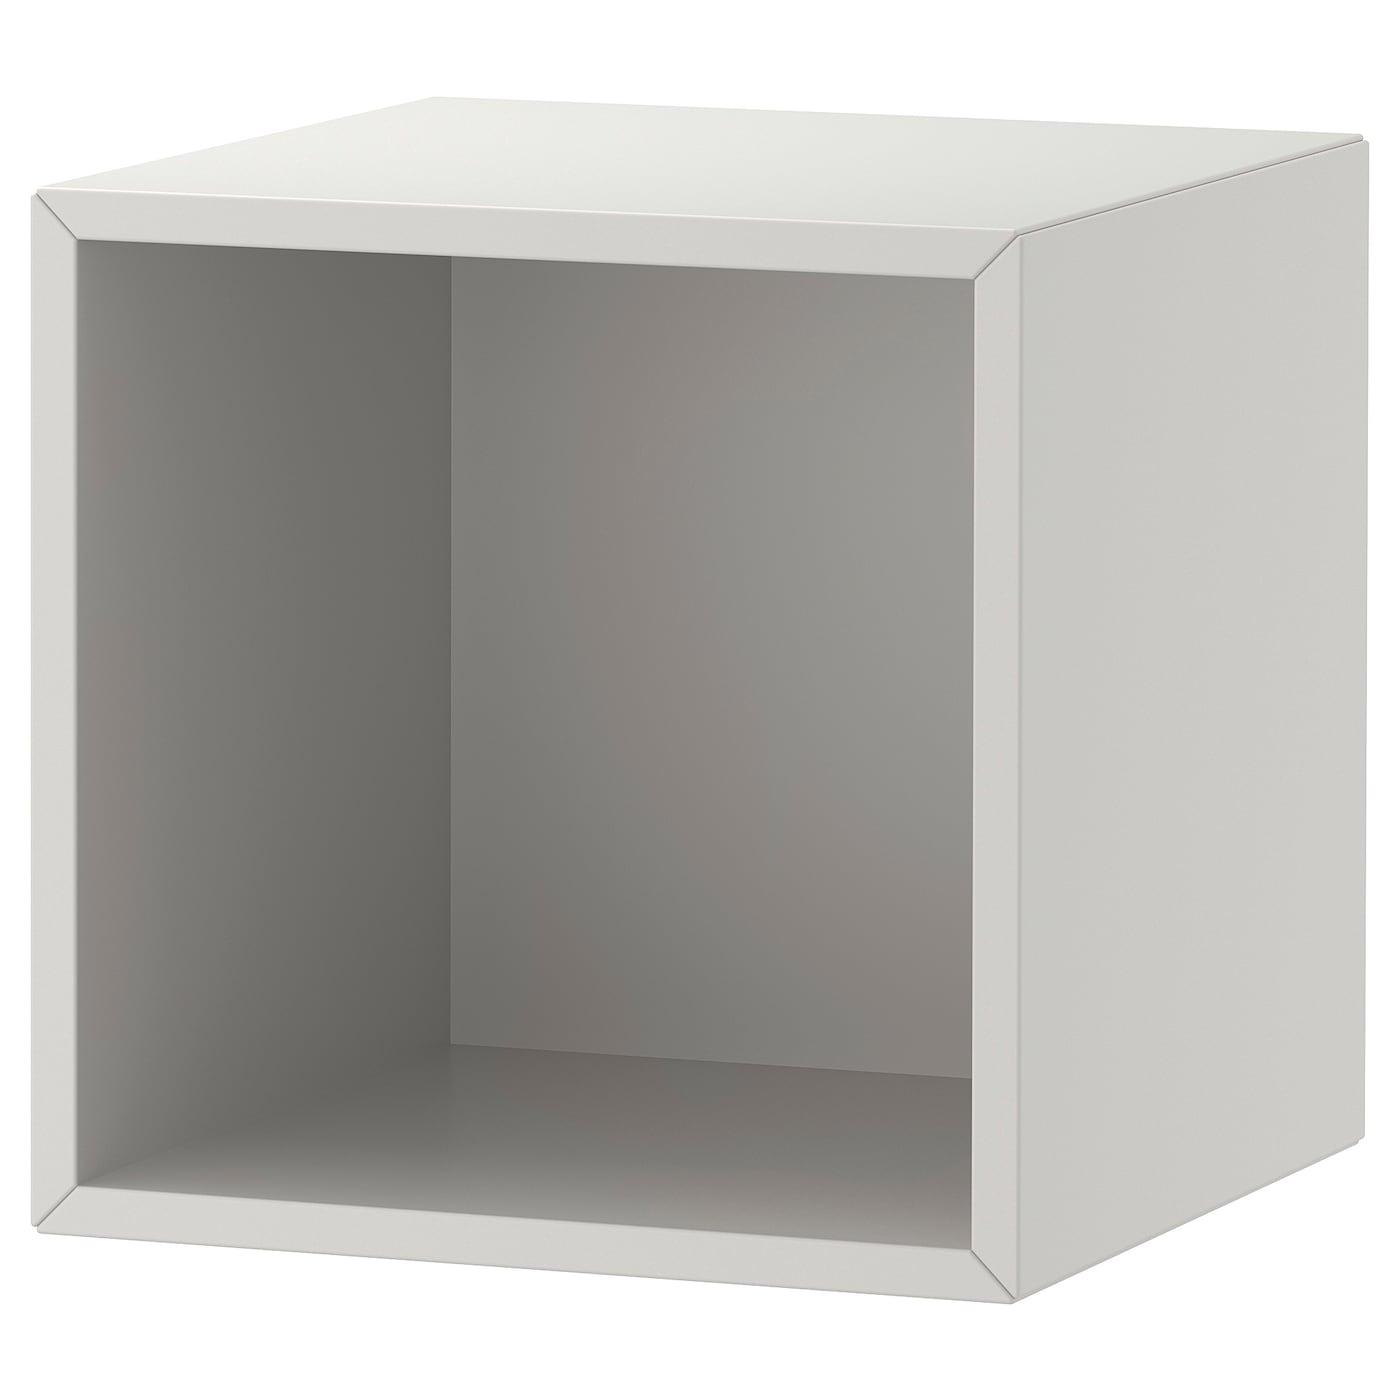 eket cabinet light grey 35 x 35 x 35 cm - ikea